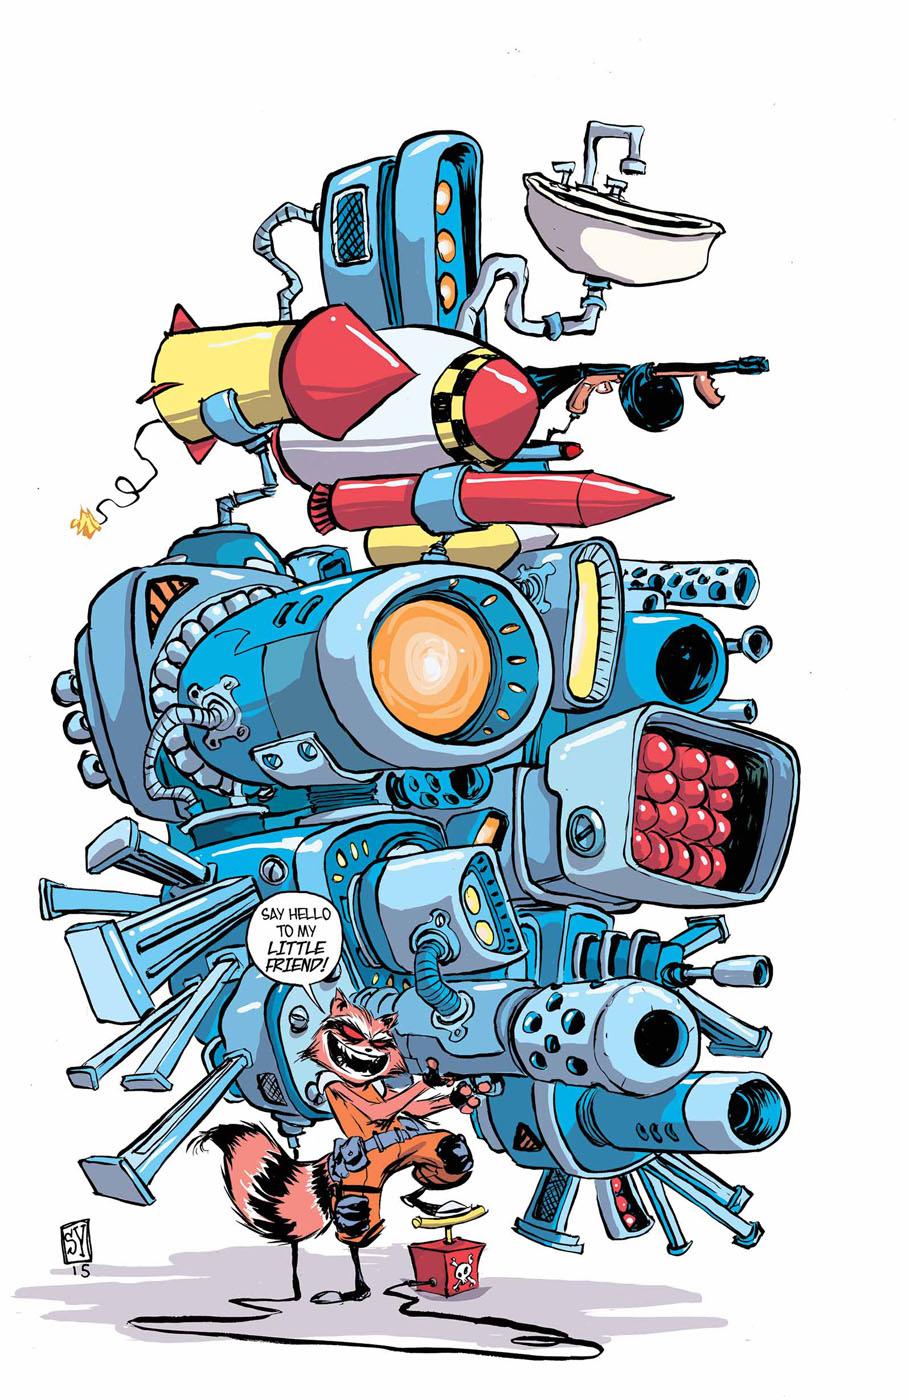 [Comics] Skottie Young, un dessineux que j'adore! - Page 2 310193rocketraccoon11